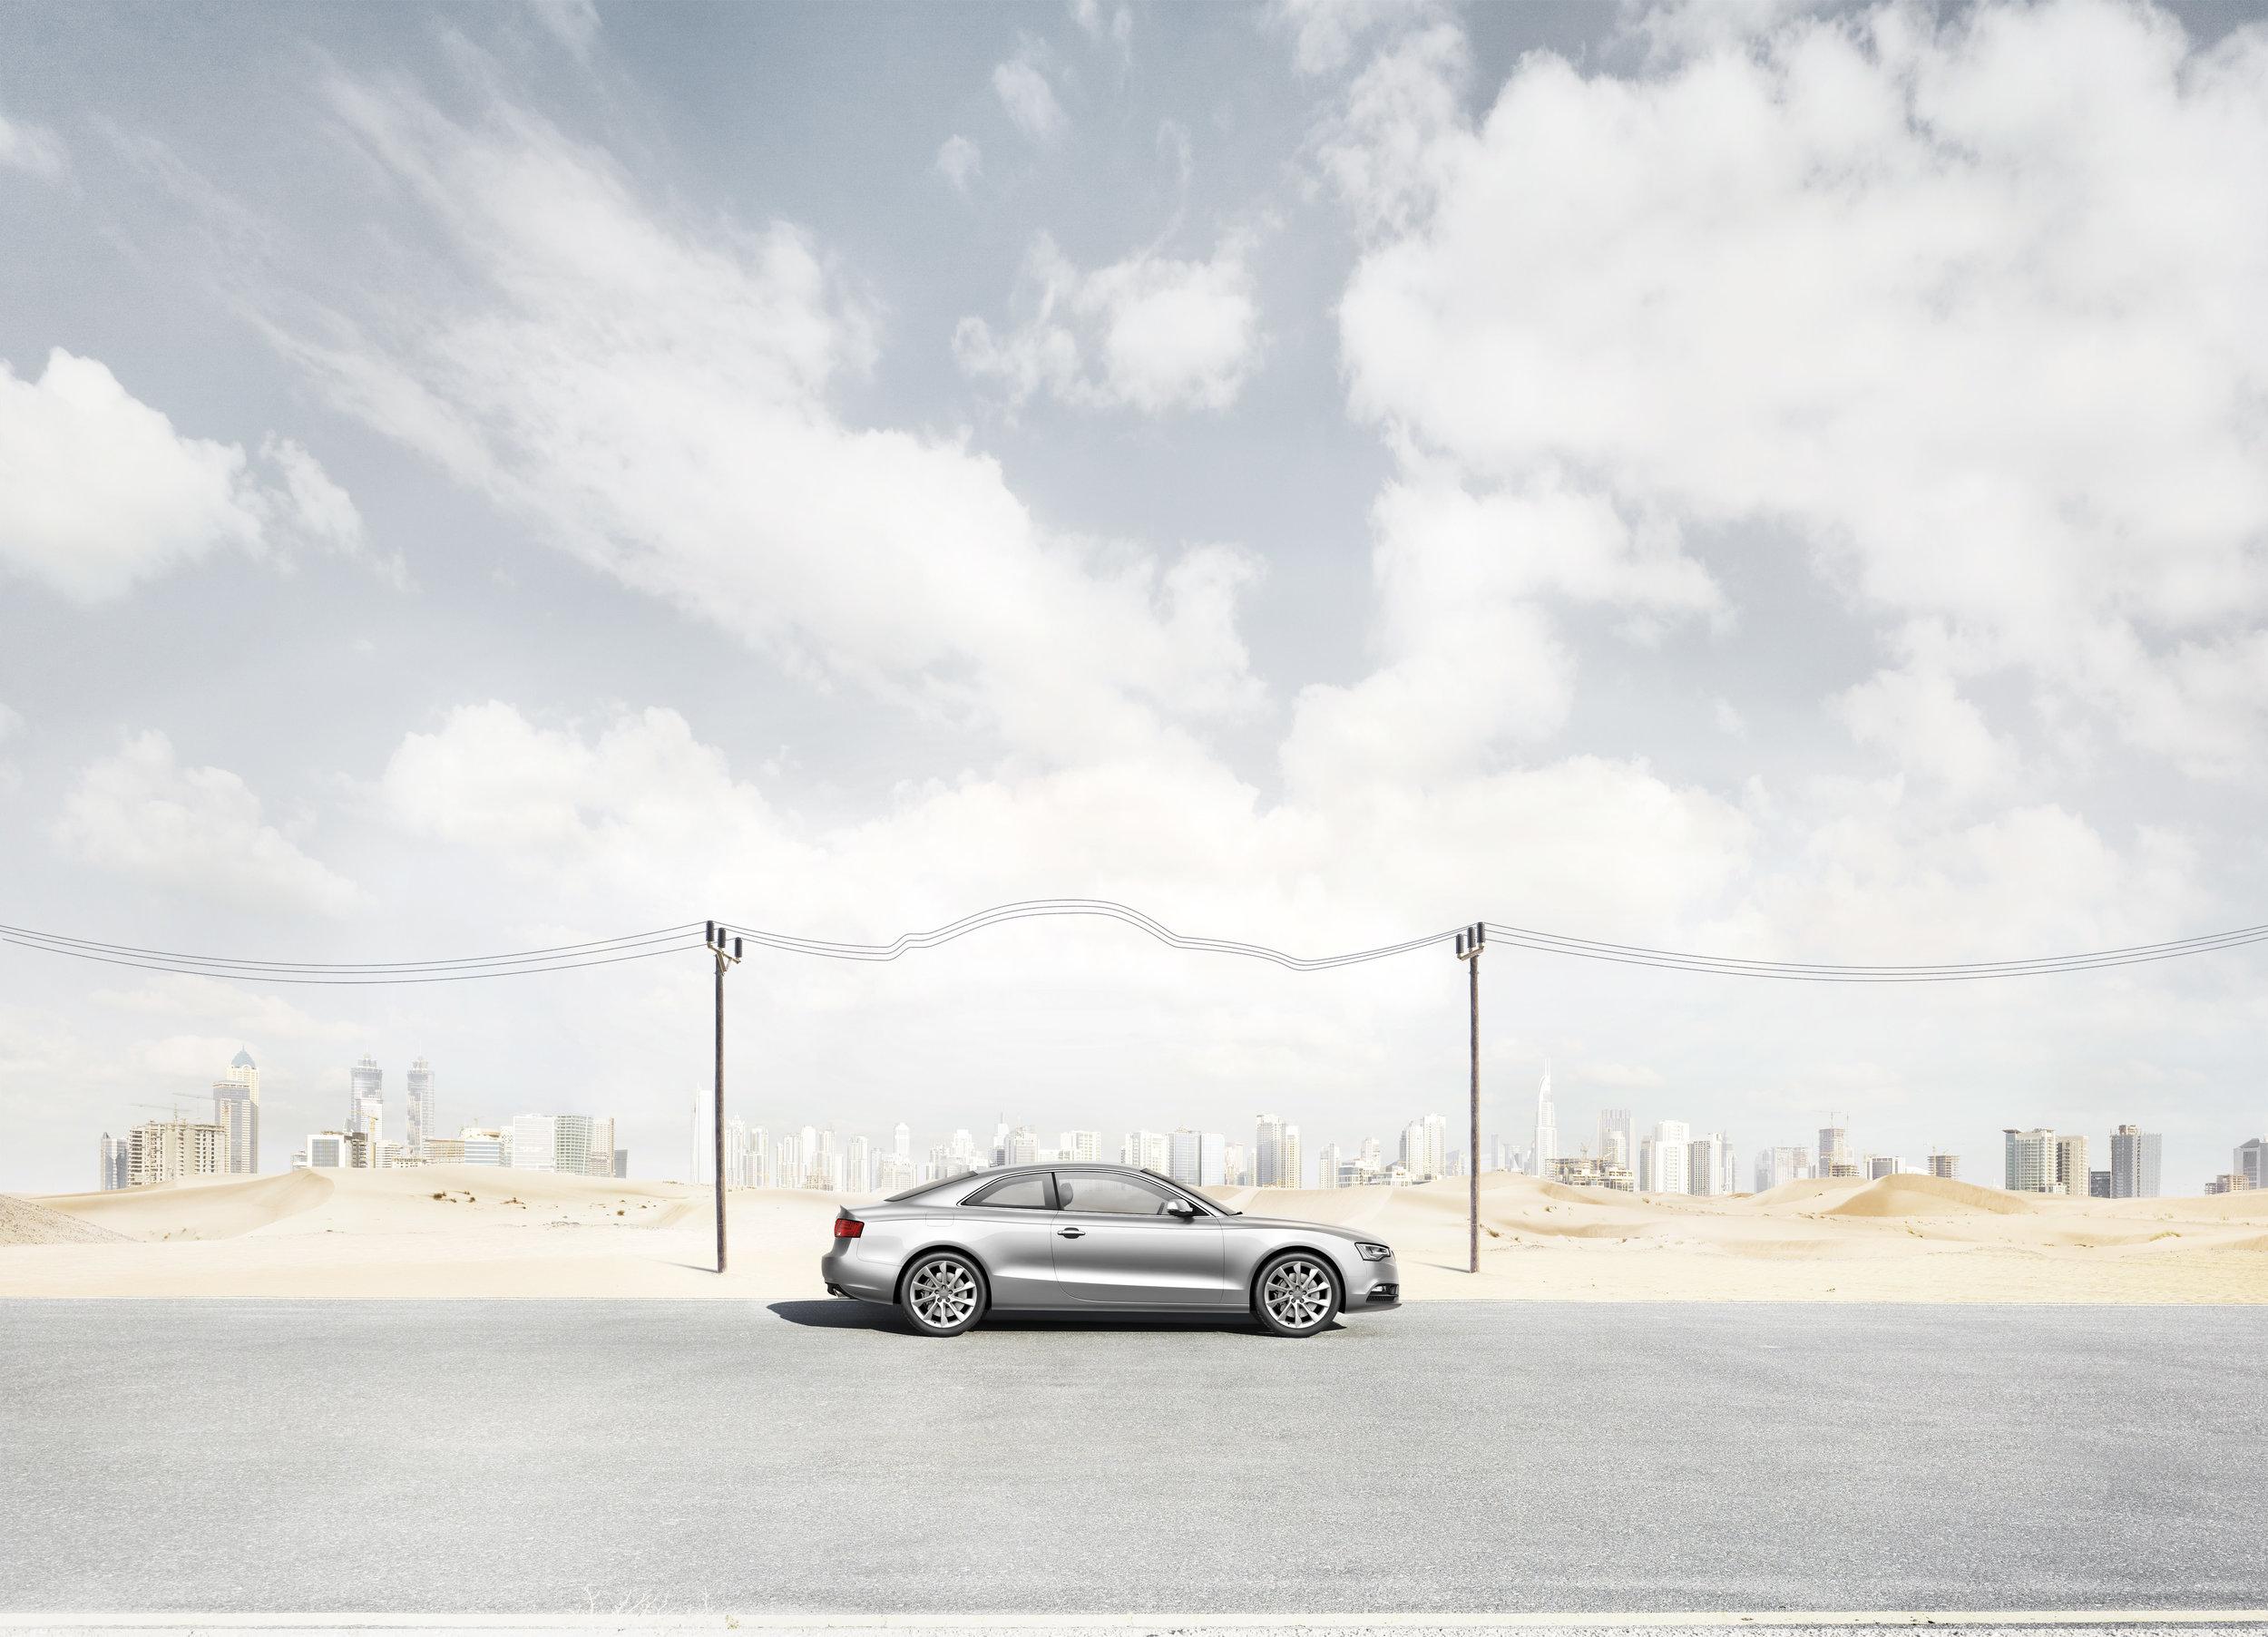 Audi   Agency - Tonic  Photographer -  Steffen Schragle